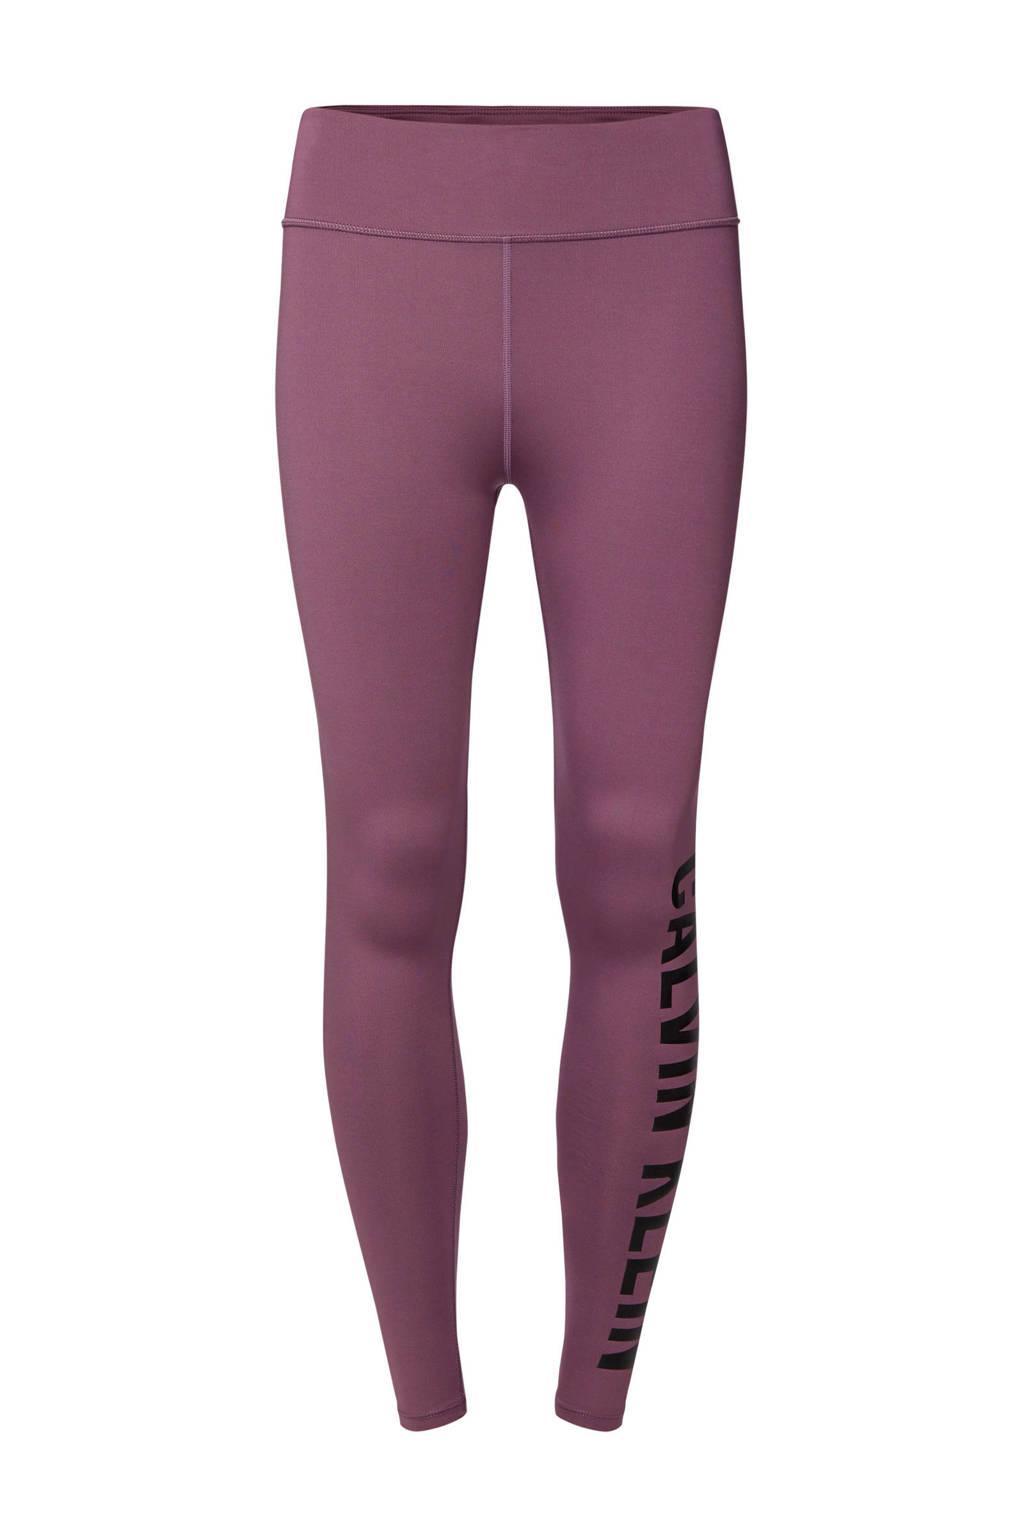 CALVIN KLEIN PERFORMANCE sportbroek paars/zwart, Paars/zwart